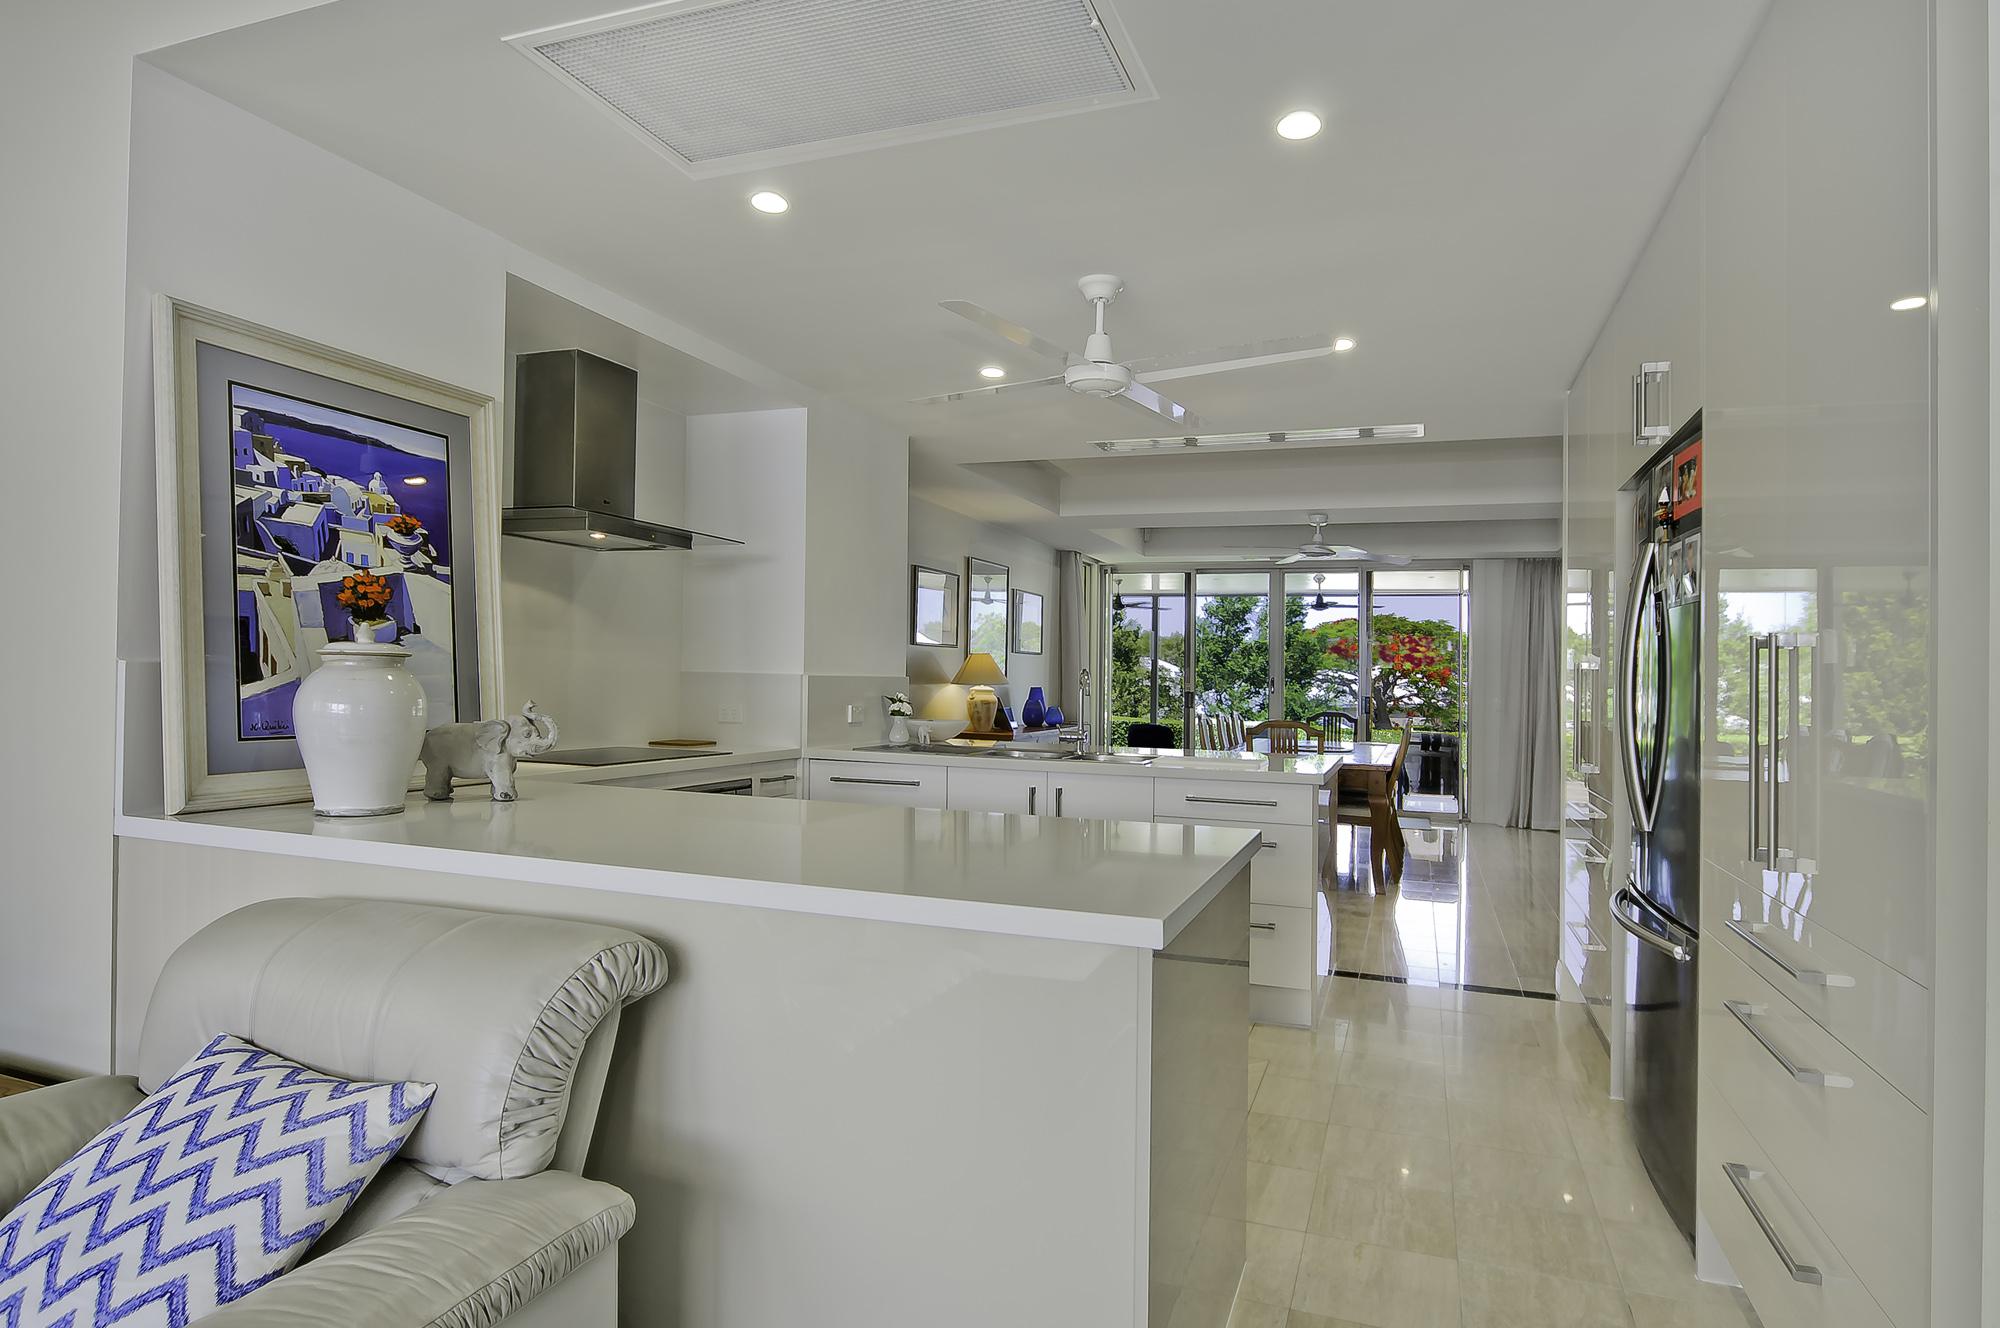 Real Estate | Gold Coast | Chevron Realty | Royal Pines Resort 5116 002